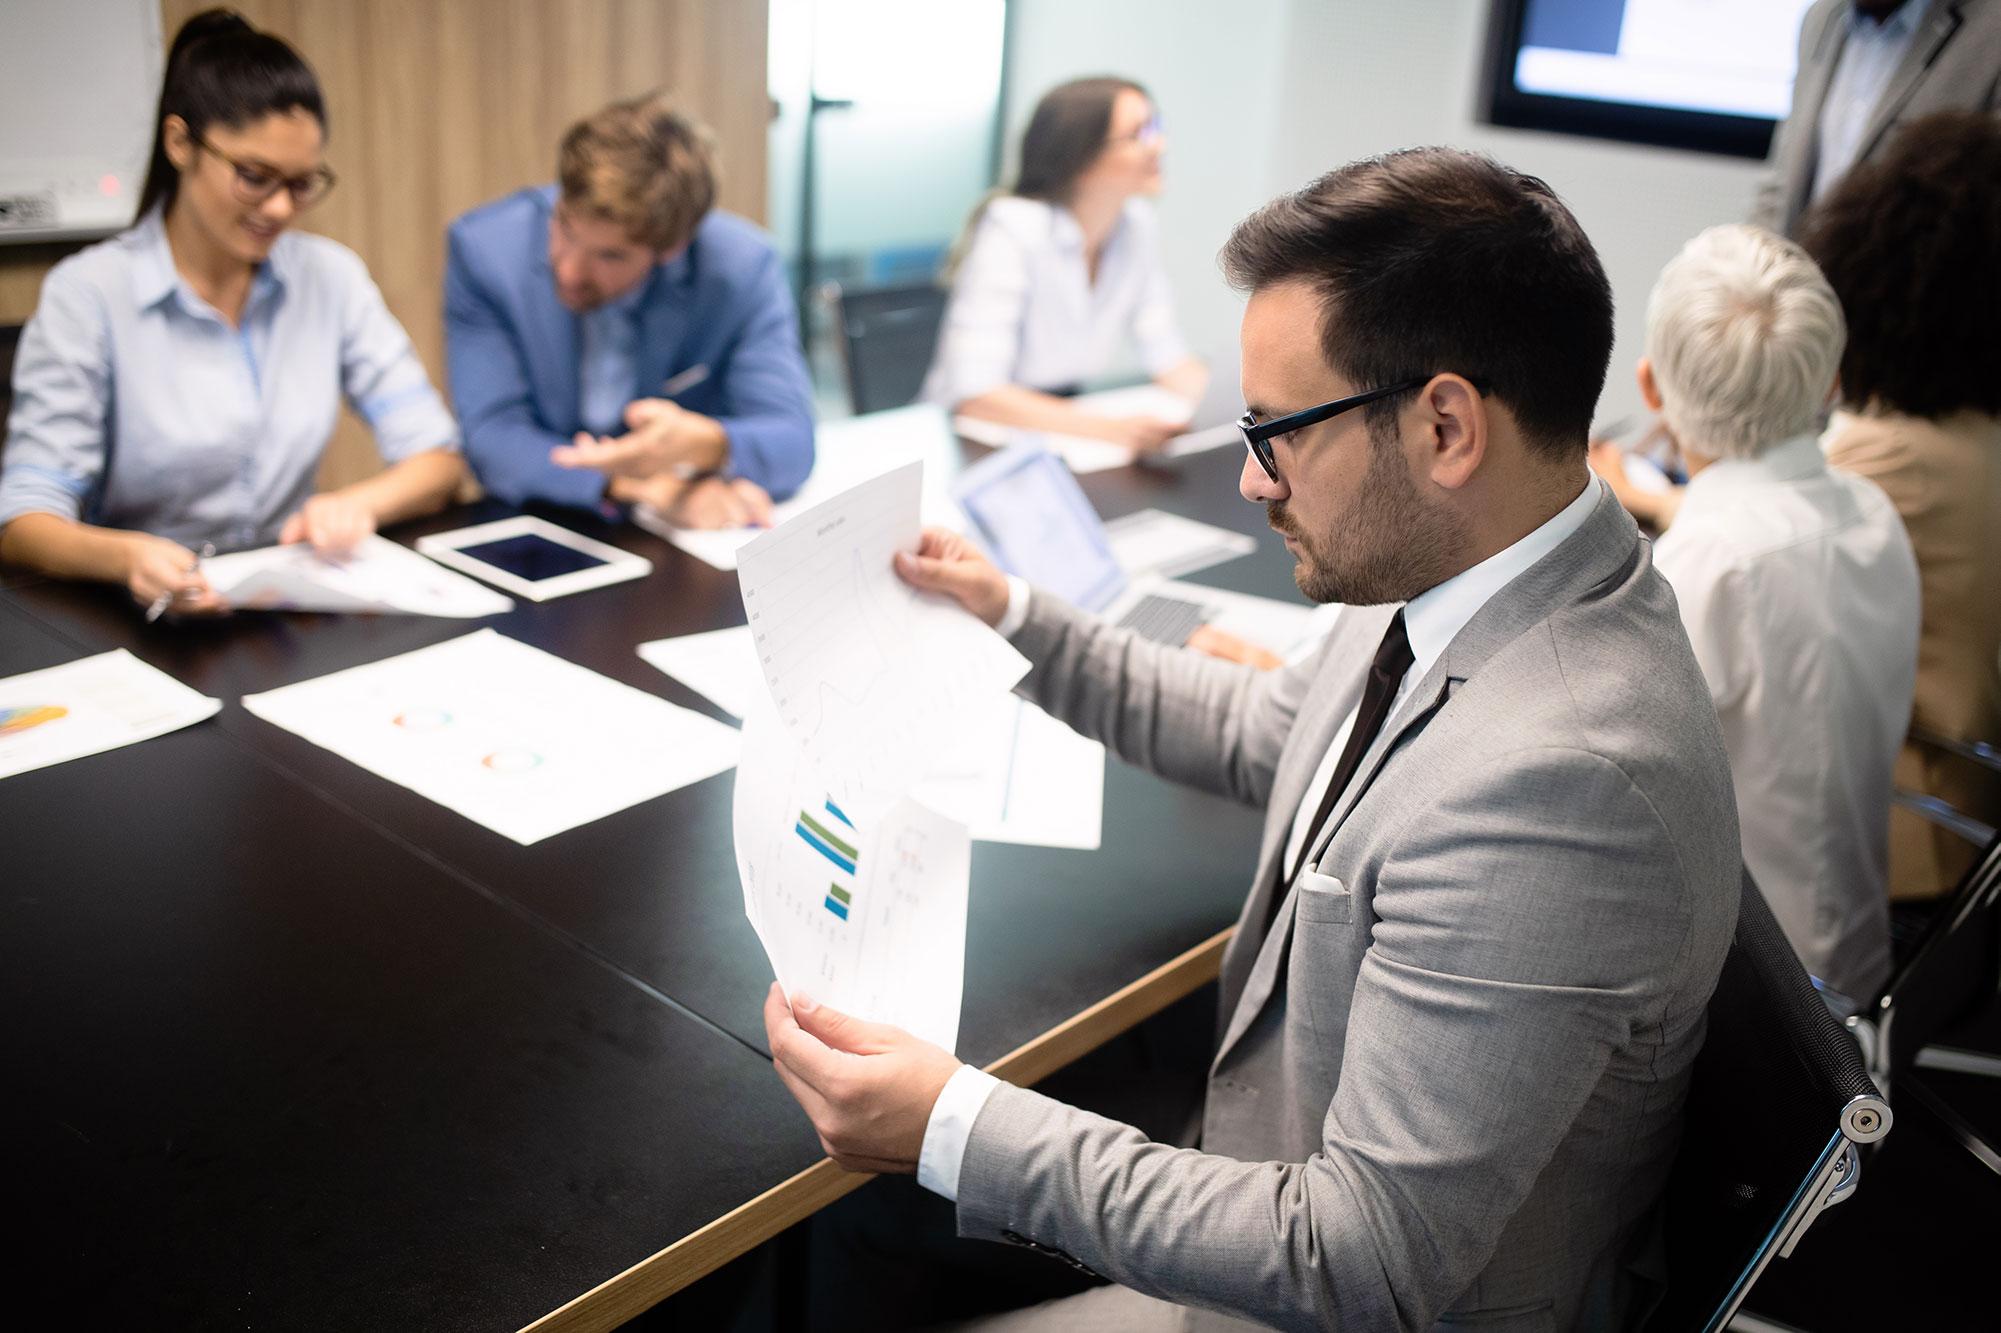 creative-business-people-working-on-business-proje-3CJVL2K.jpg